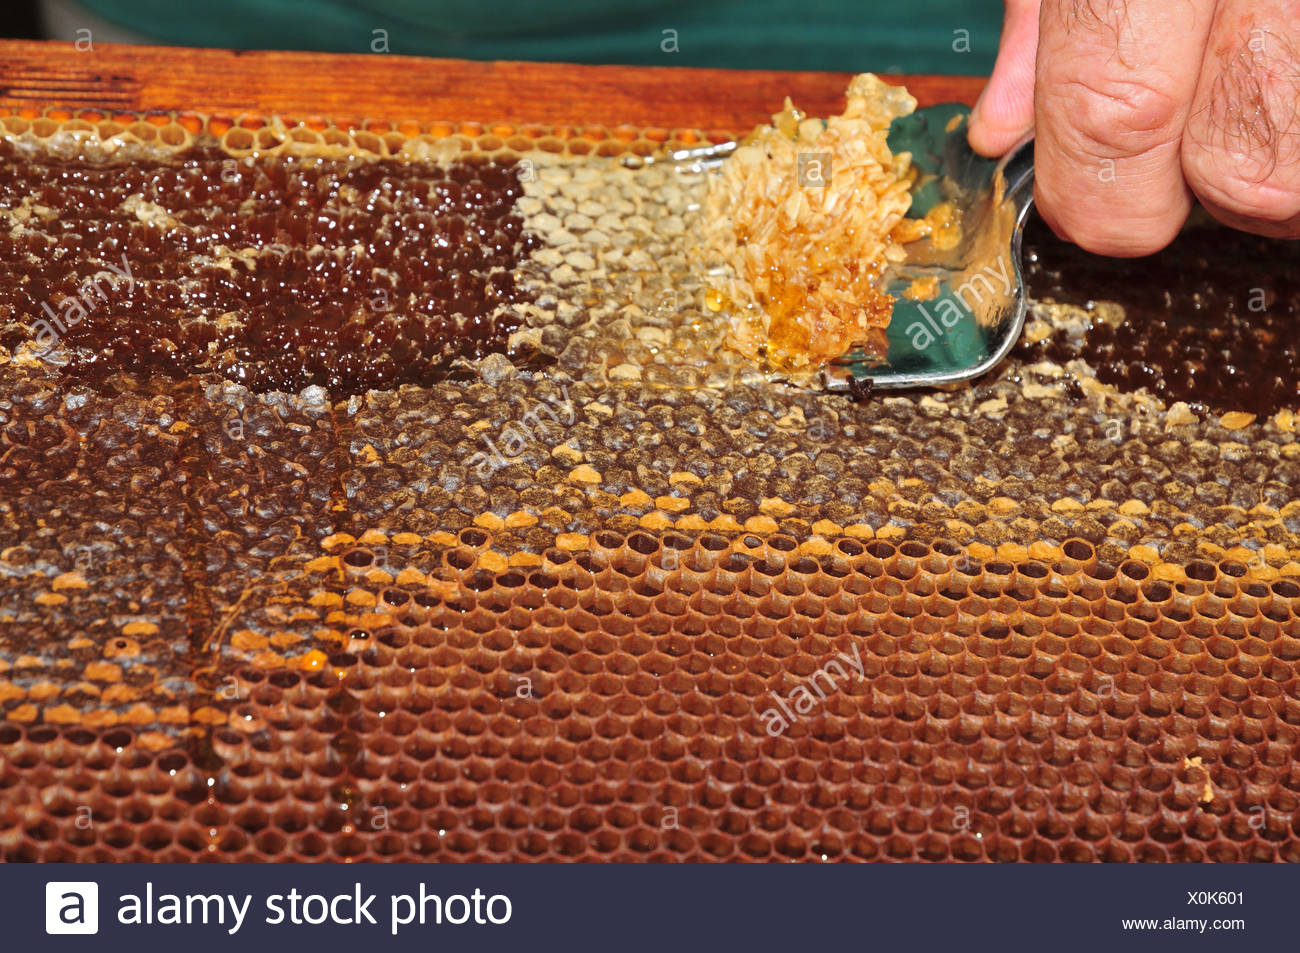 Honey Extraction Stock Photos Honey Extraction Stock Images Alamy